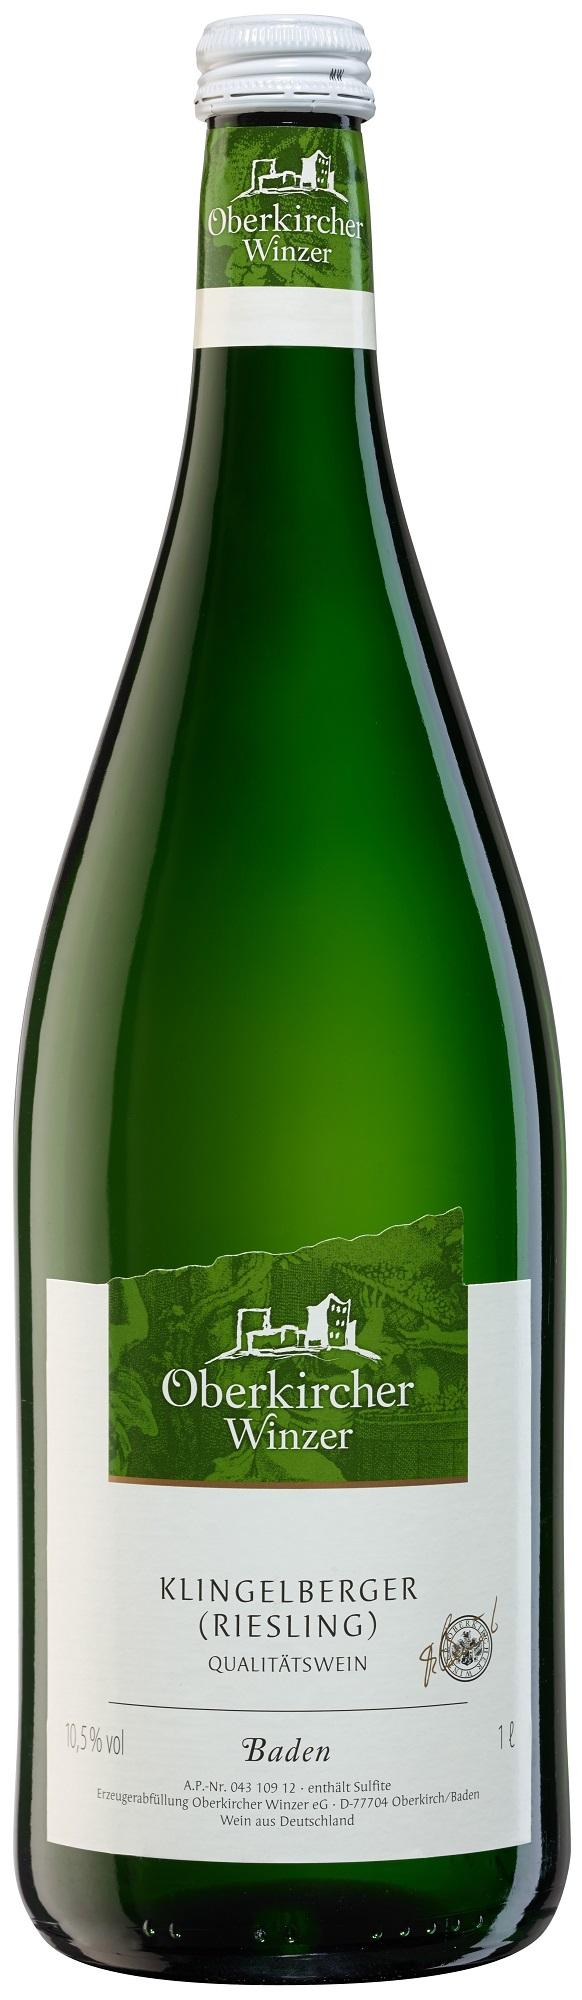 Collection Oberkirch , Riesling Qualitätswein